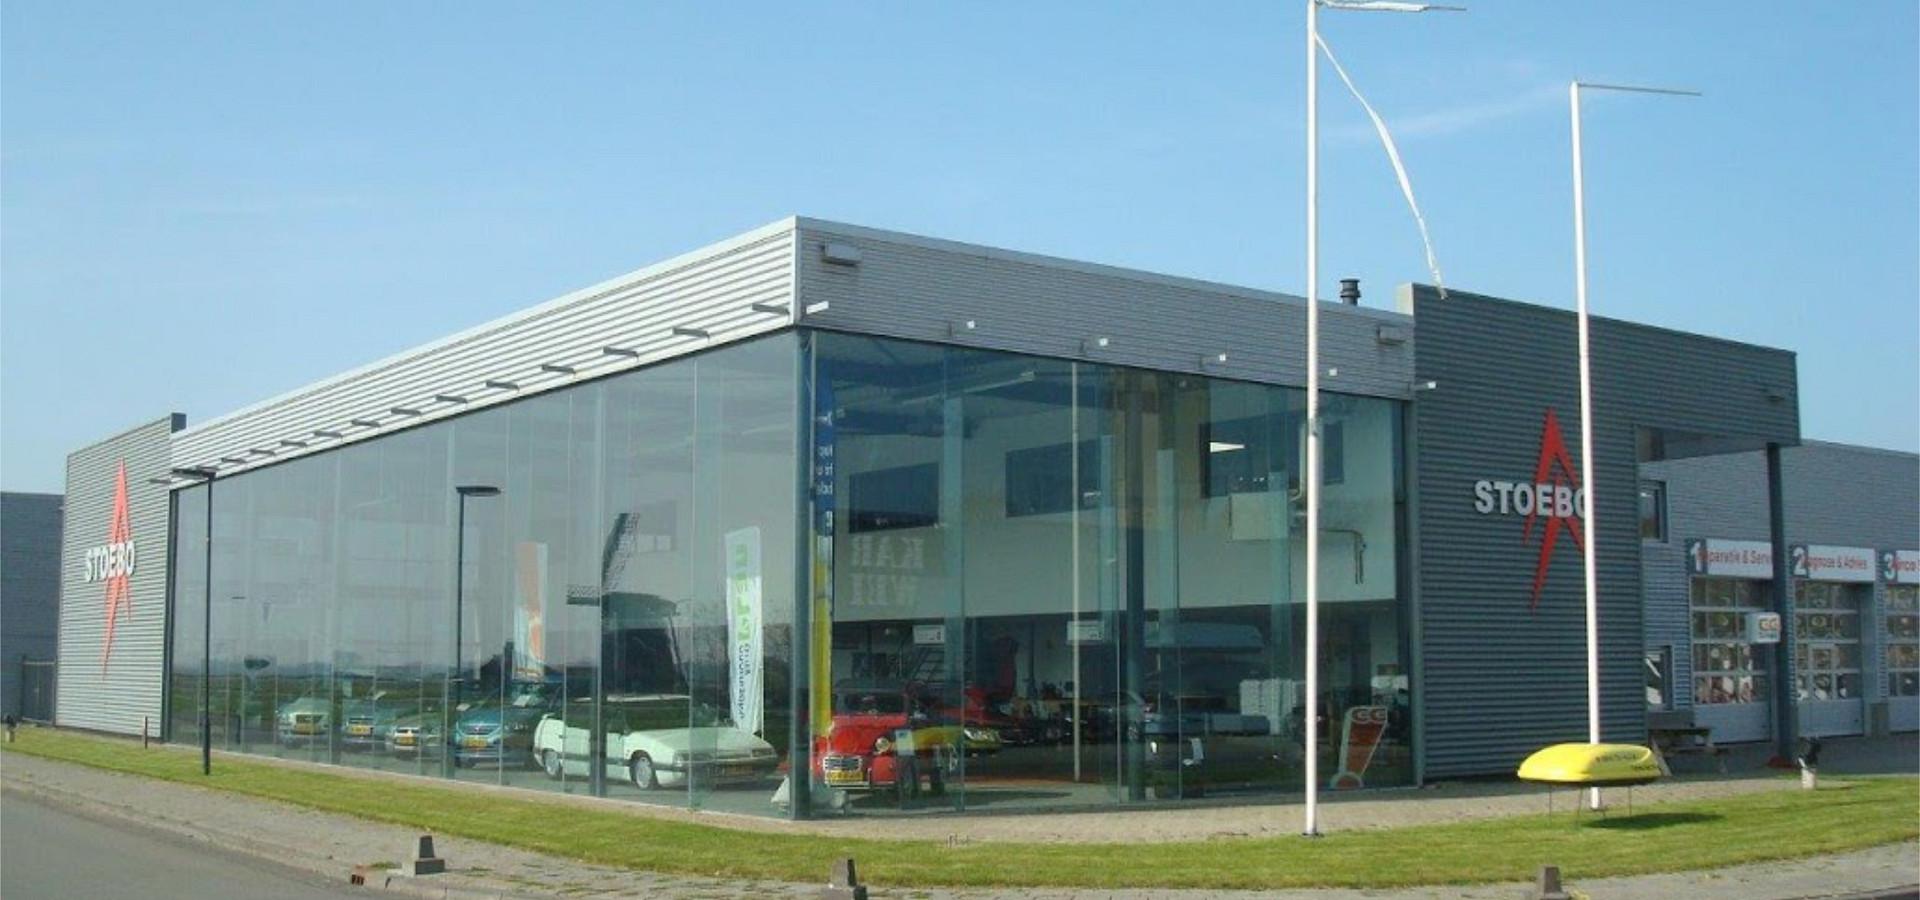 Carteam Autobedrijf Stoebo